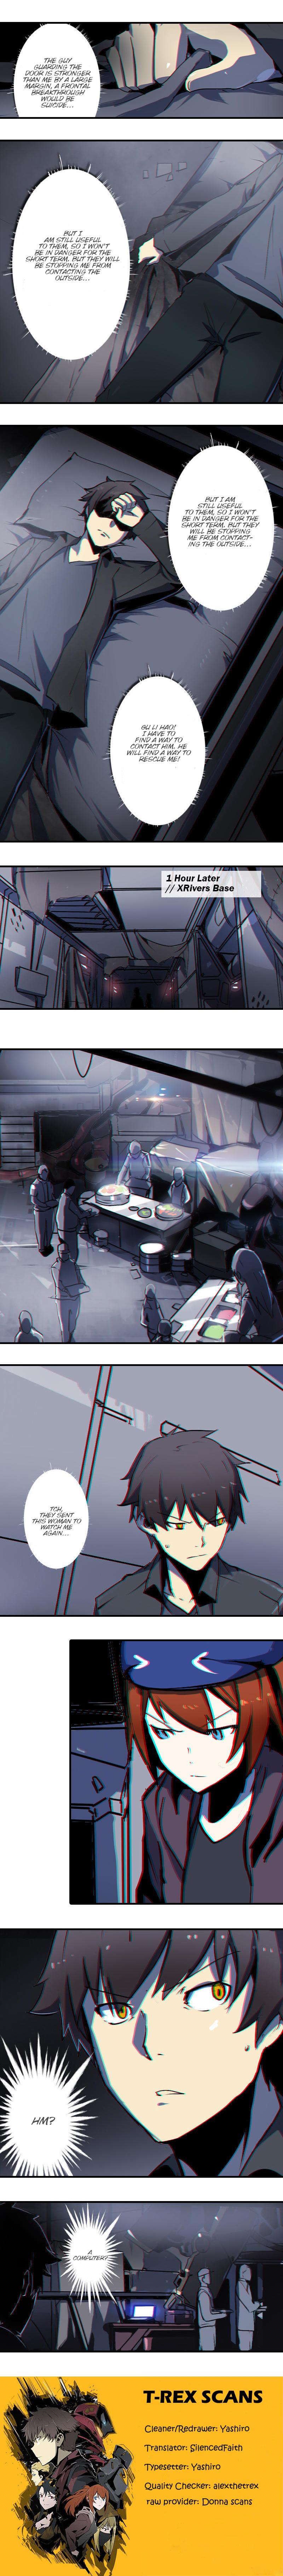 https://img2.nineanime.com/comics/pic2/0/29696/1254960/e4adac0568300c628703a99f195f6a5e.jpg Page 1